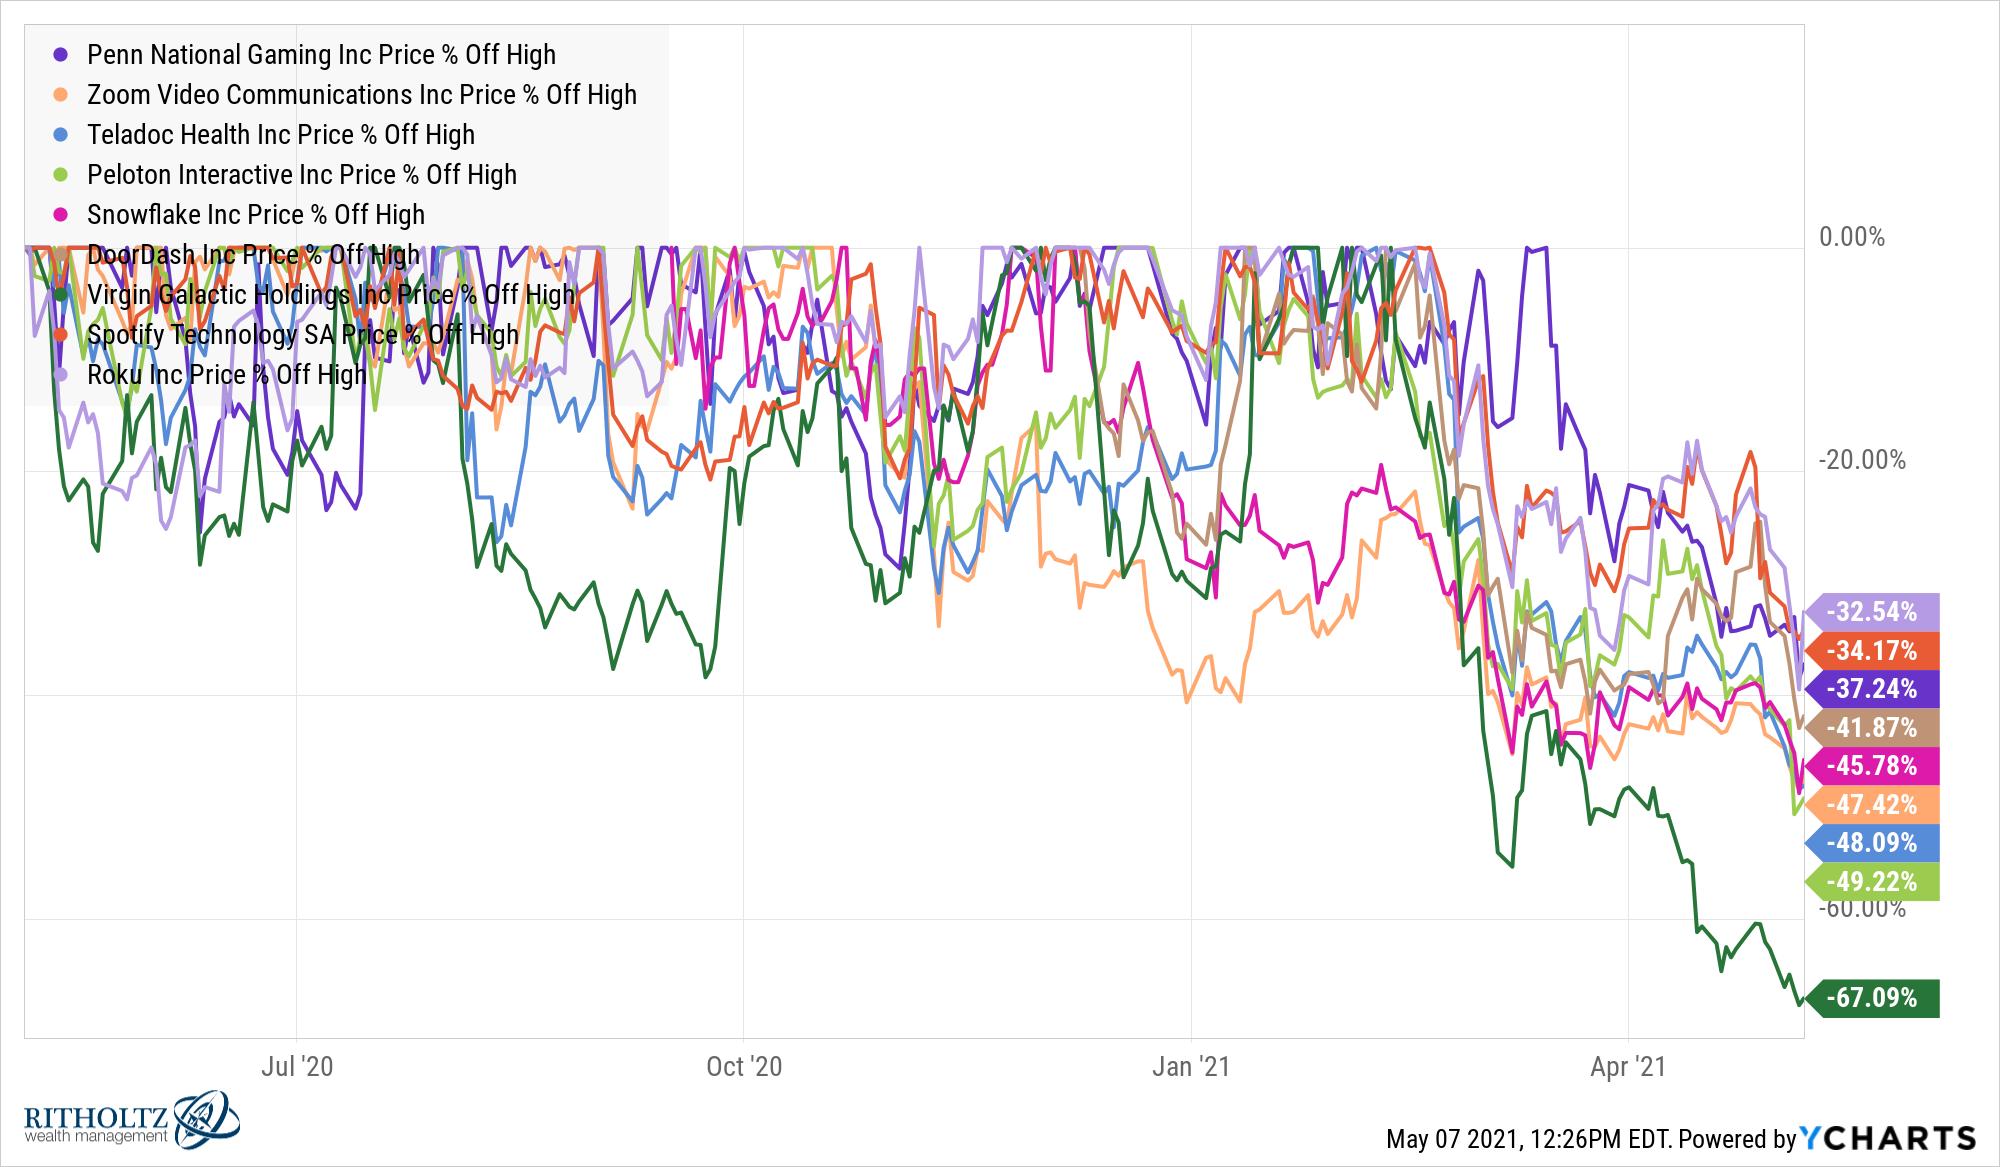 PENN_ZM_TDOC_PTON_SNOW_DASH_SPCE_SPOT_ROKU_chart.png